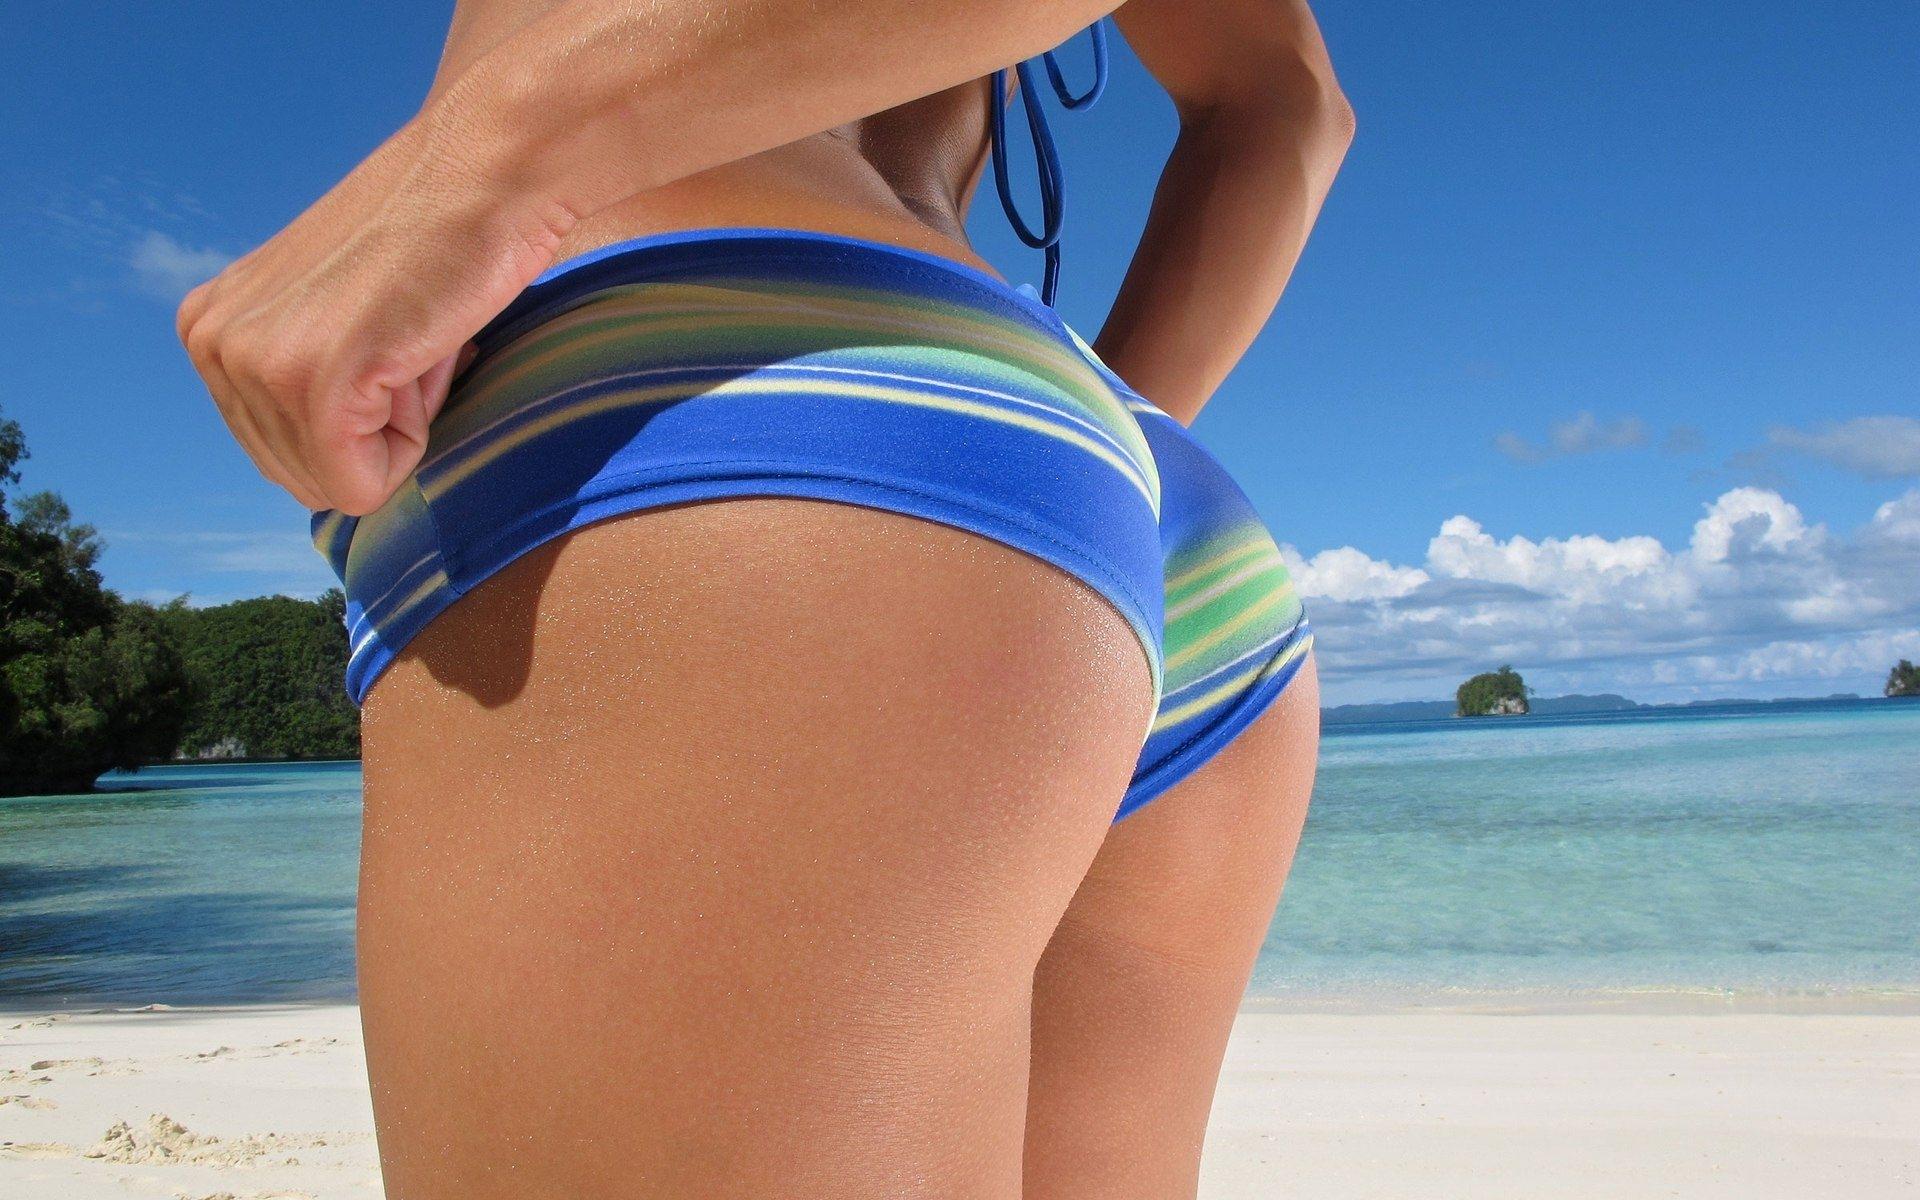 Brielle Biermann Flaunts Bikini Butt, Gets Dragged By Body